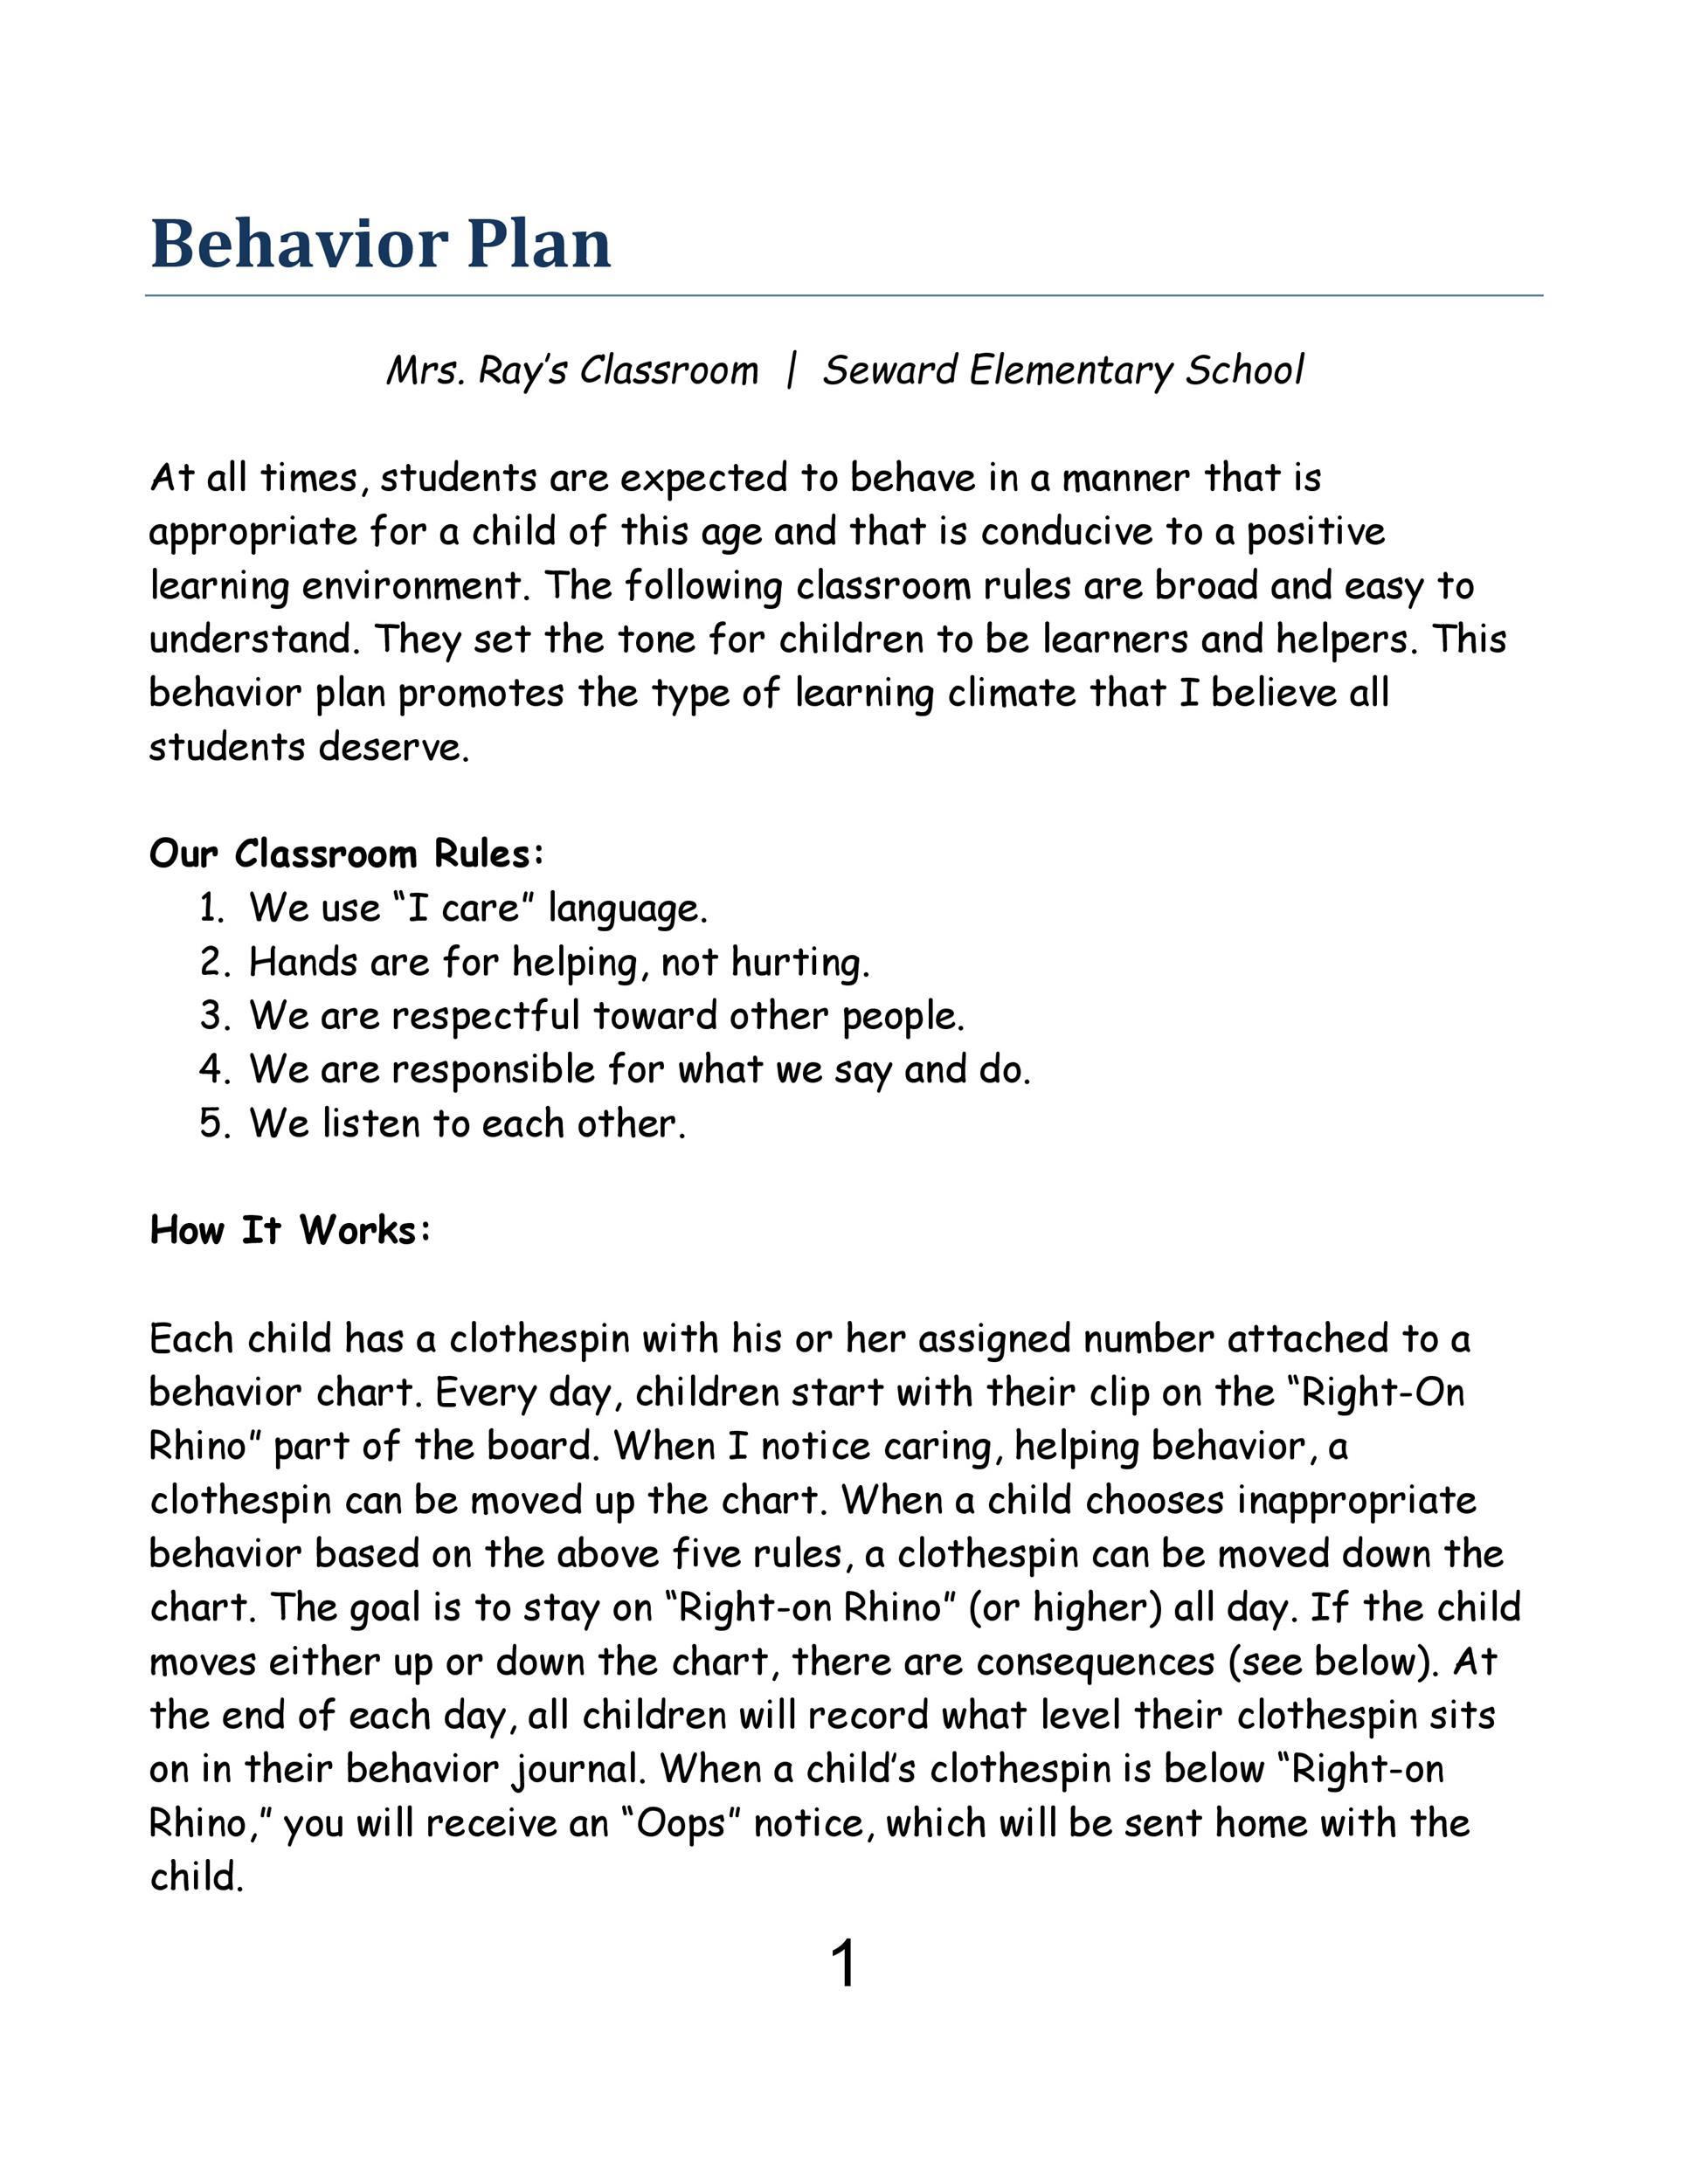 42 Printable Behavior Chart Templates for Kids ᐅ Template Lab